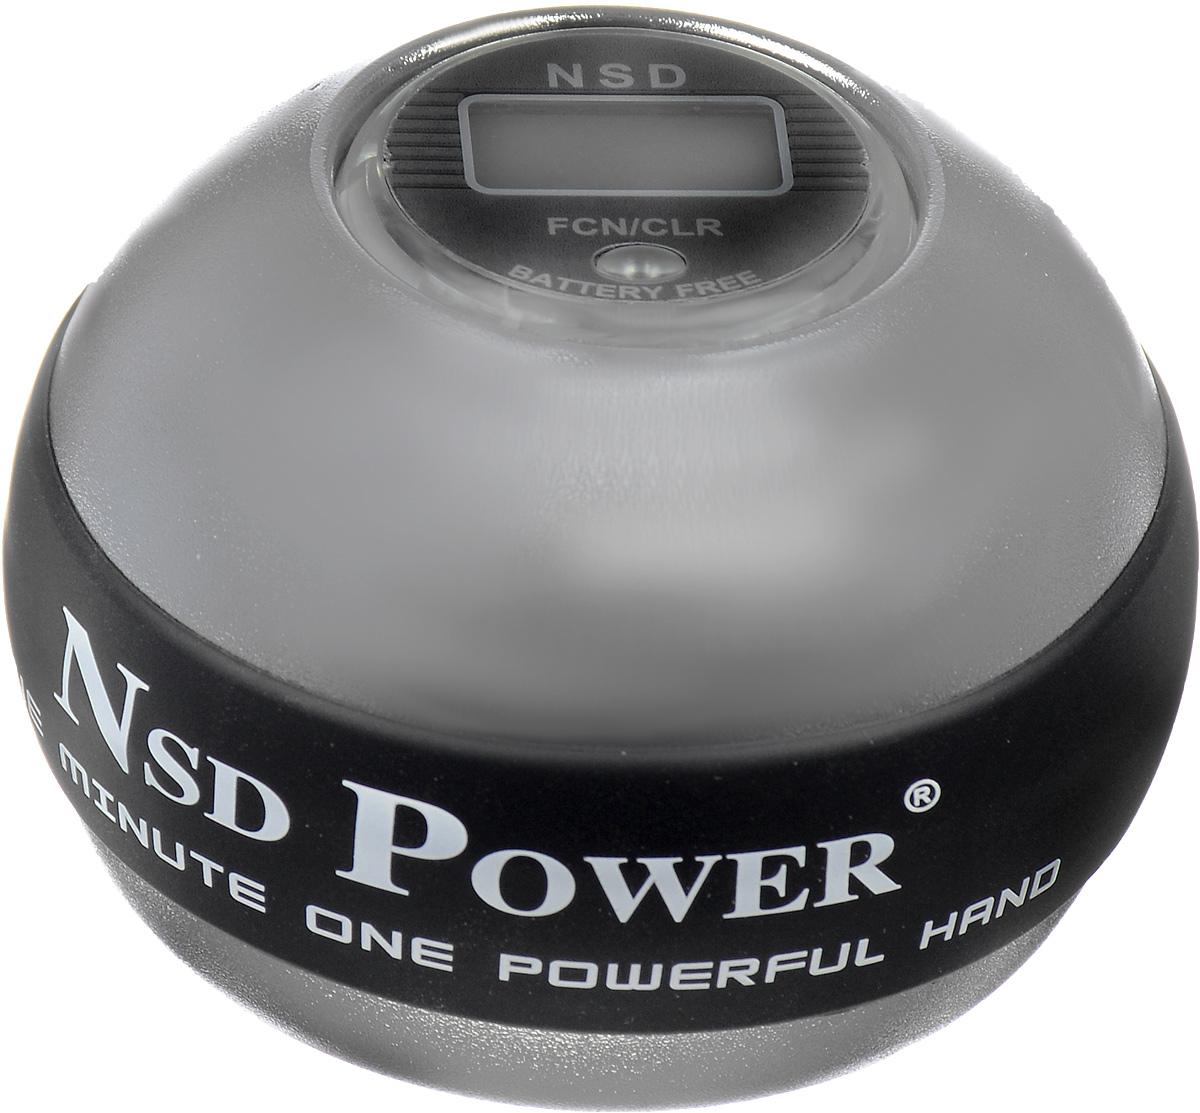 Тренажер кистевой NSD Power 888 Metal Titan. PB-888C SILVER powerball neon red pro кистевой тренажер со счетчиком